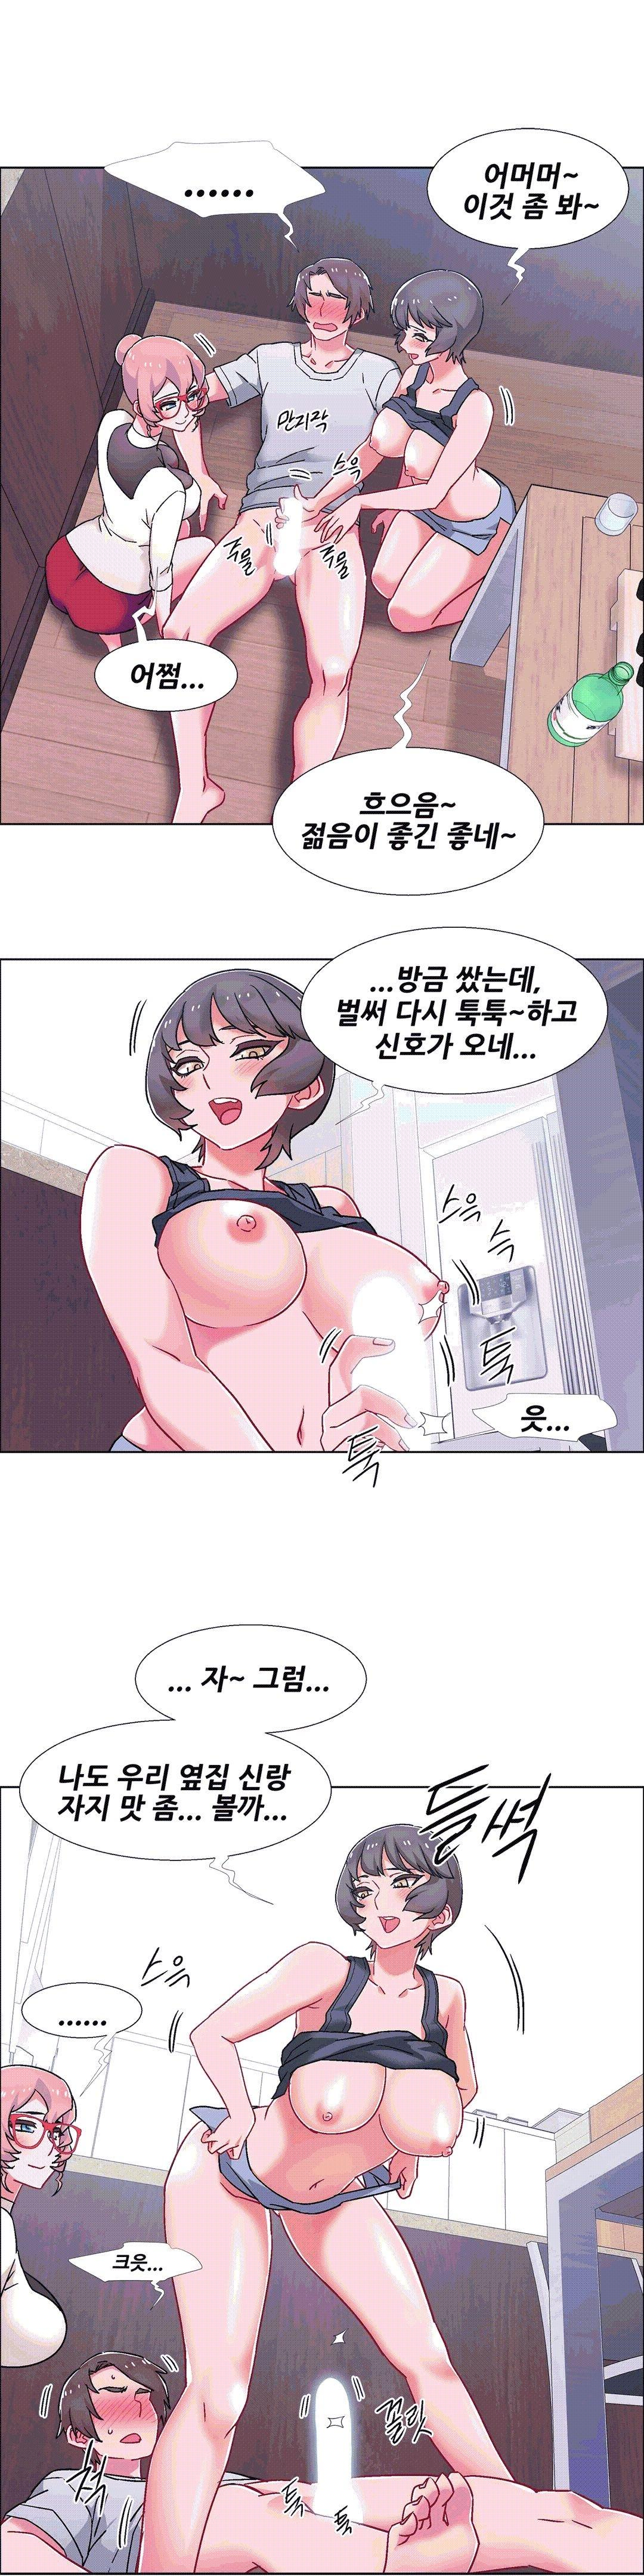 [Studio Wannabe] Rental Girls | 出租女郎 Ch. 33-58 [Chinese]  第二季 完结 613